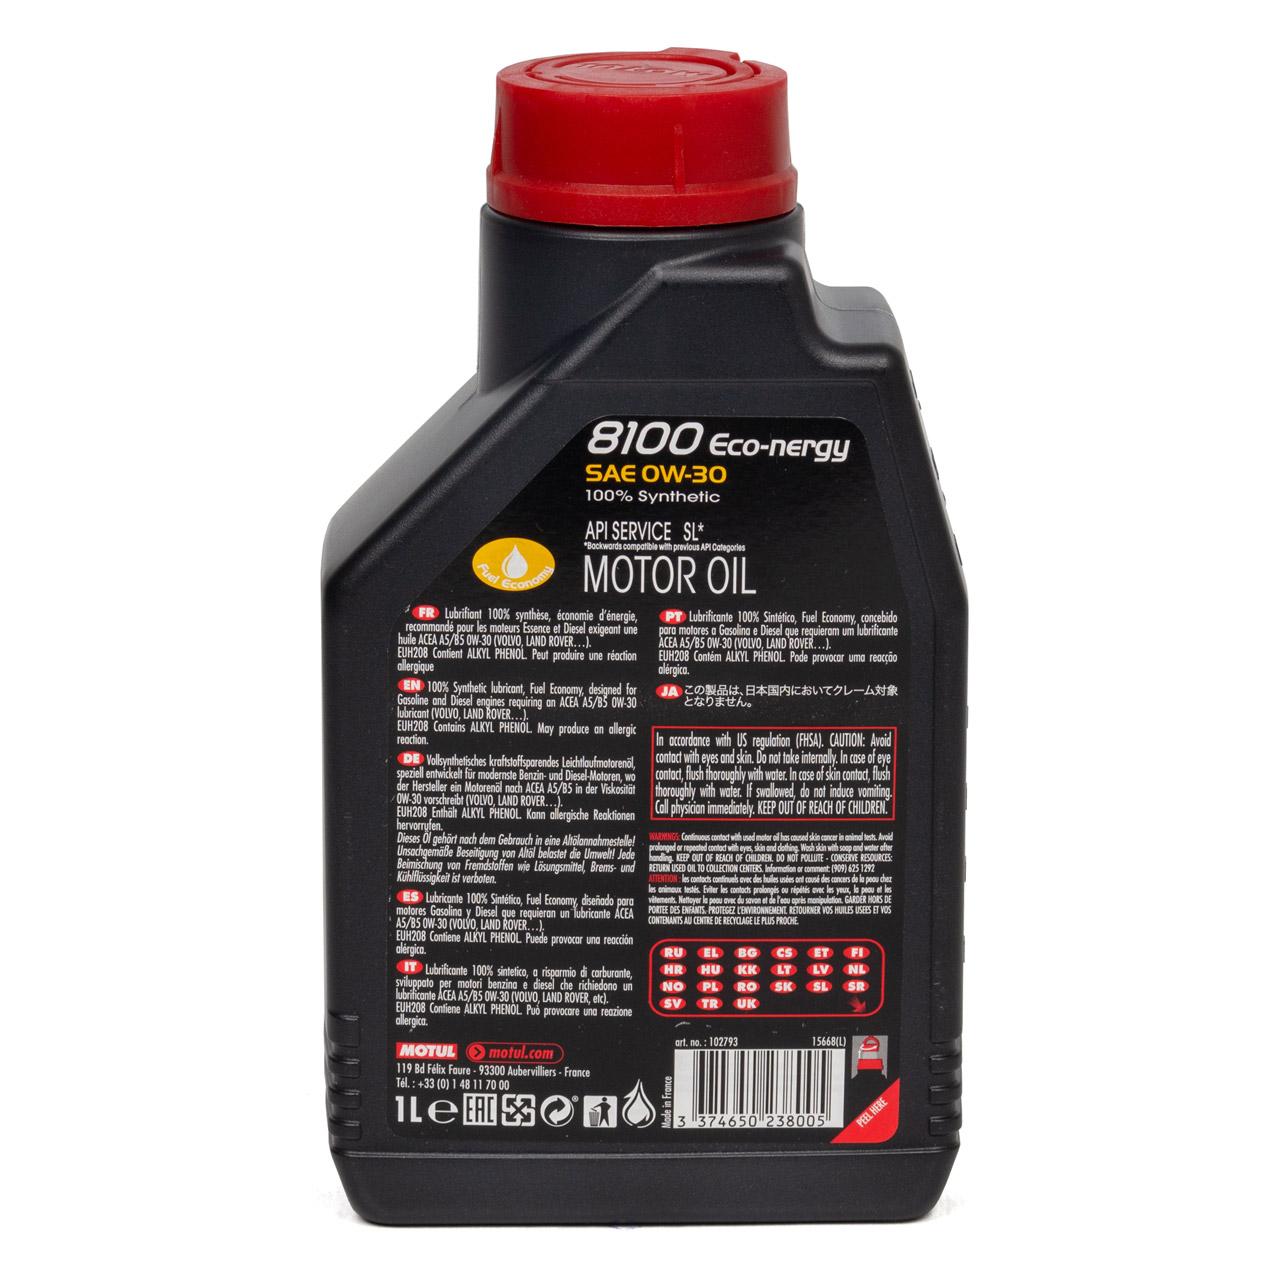 MOTUL 8100 ECO-nergy Motoröl Öl 0W30 ACEA A5/B5 VOLVO VCC95200377 - 1L 1 Liter